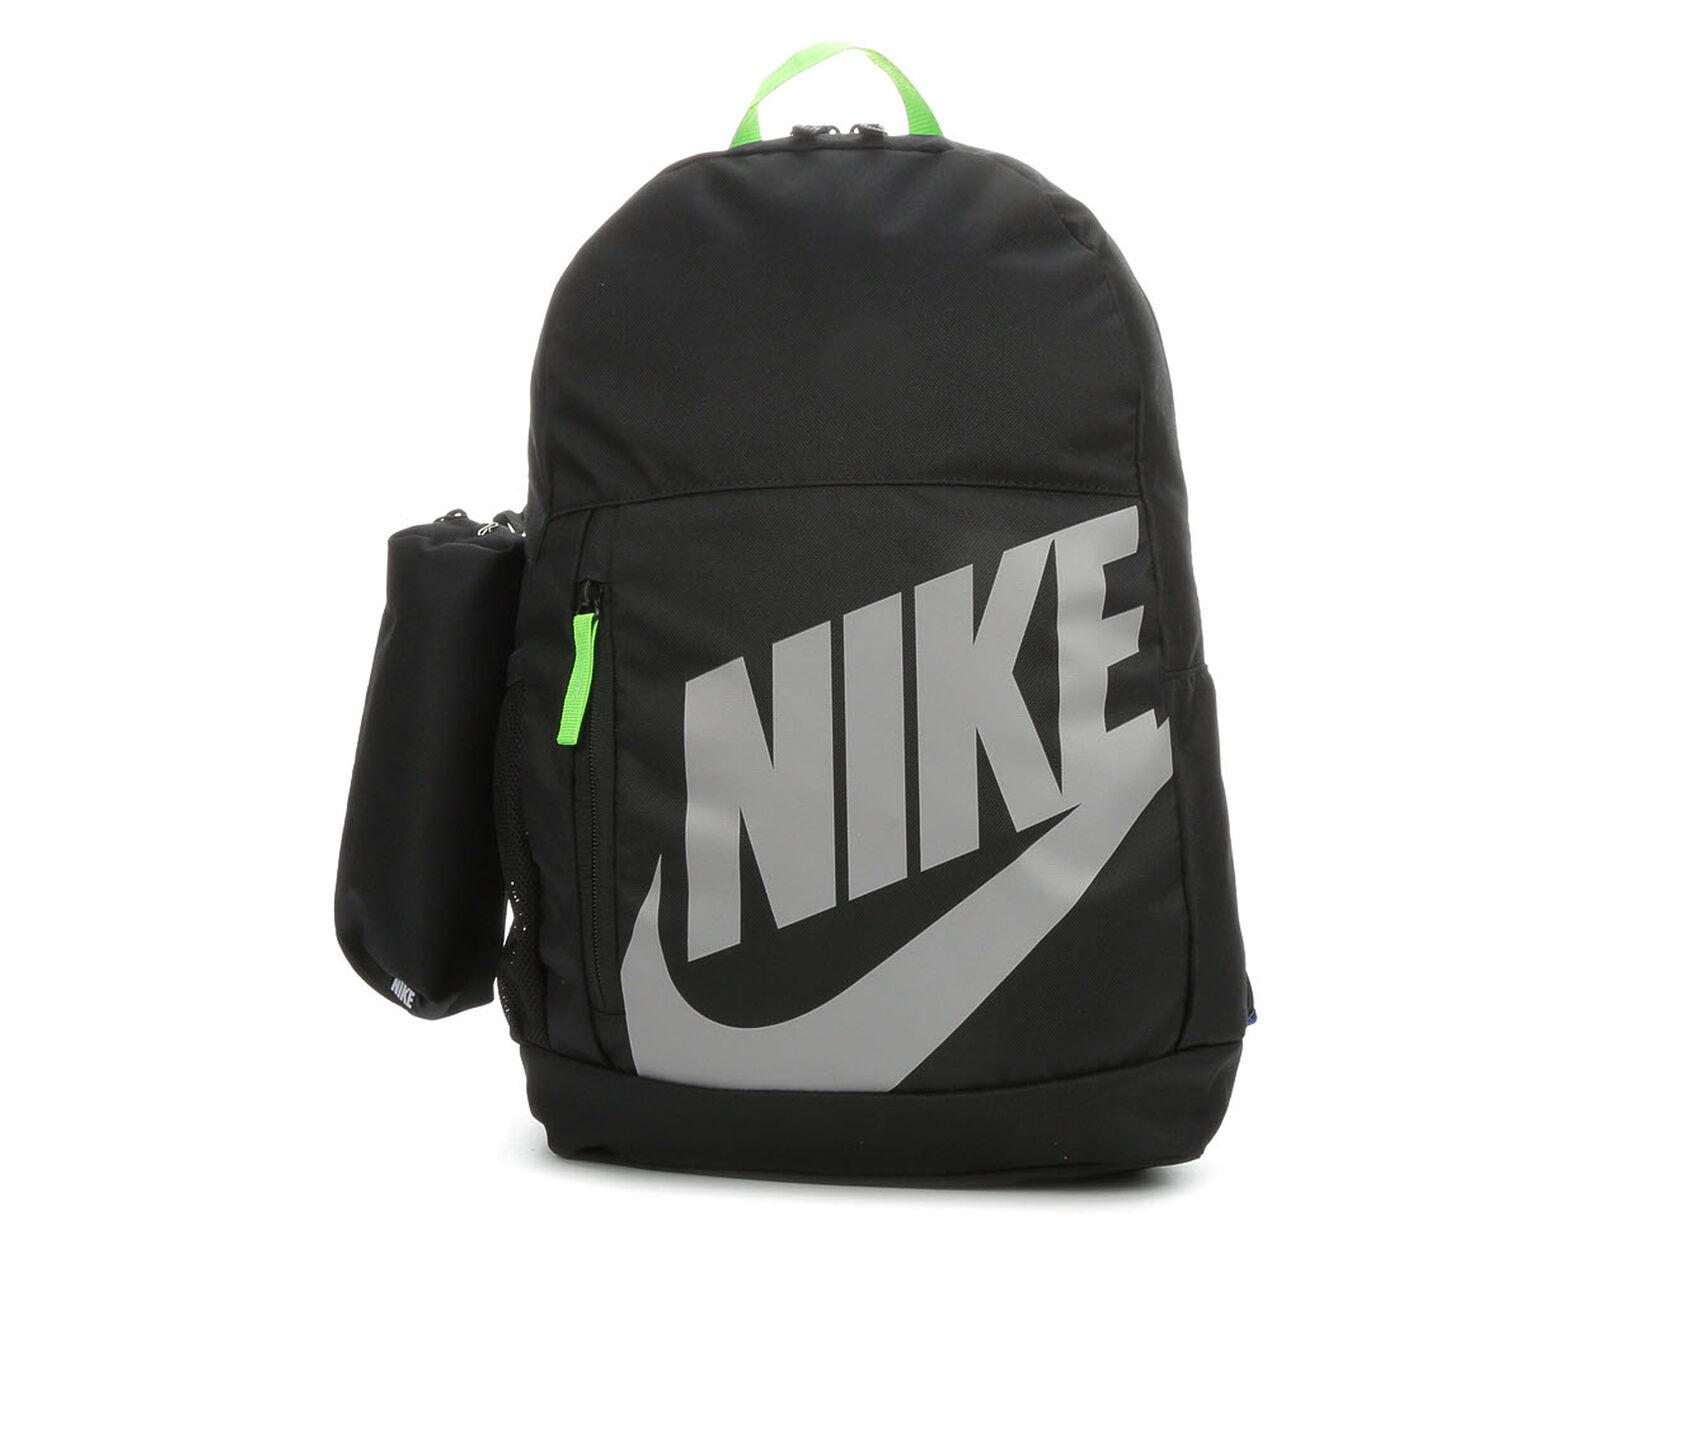 65766524287 Nike Elemental Backpack | Shoe Carnival